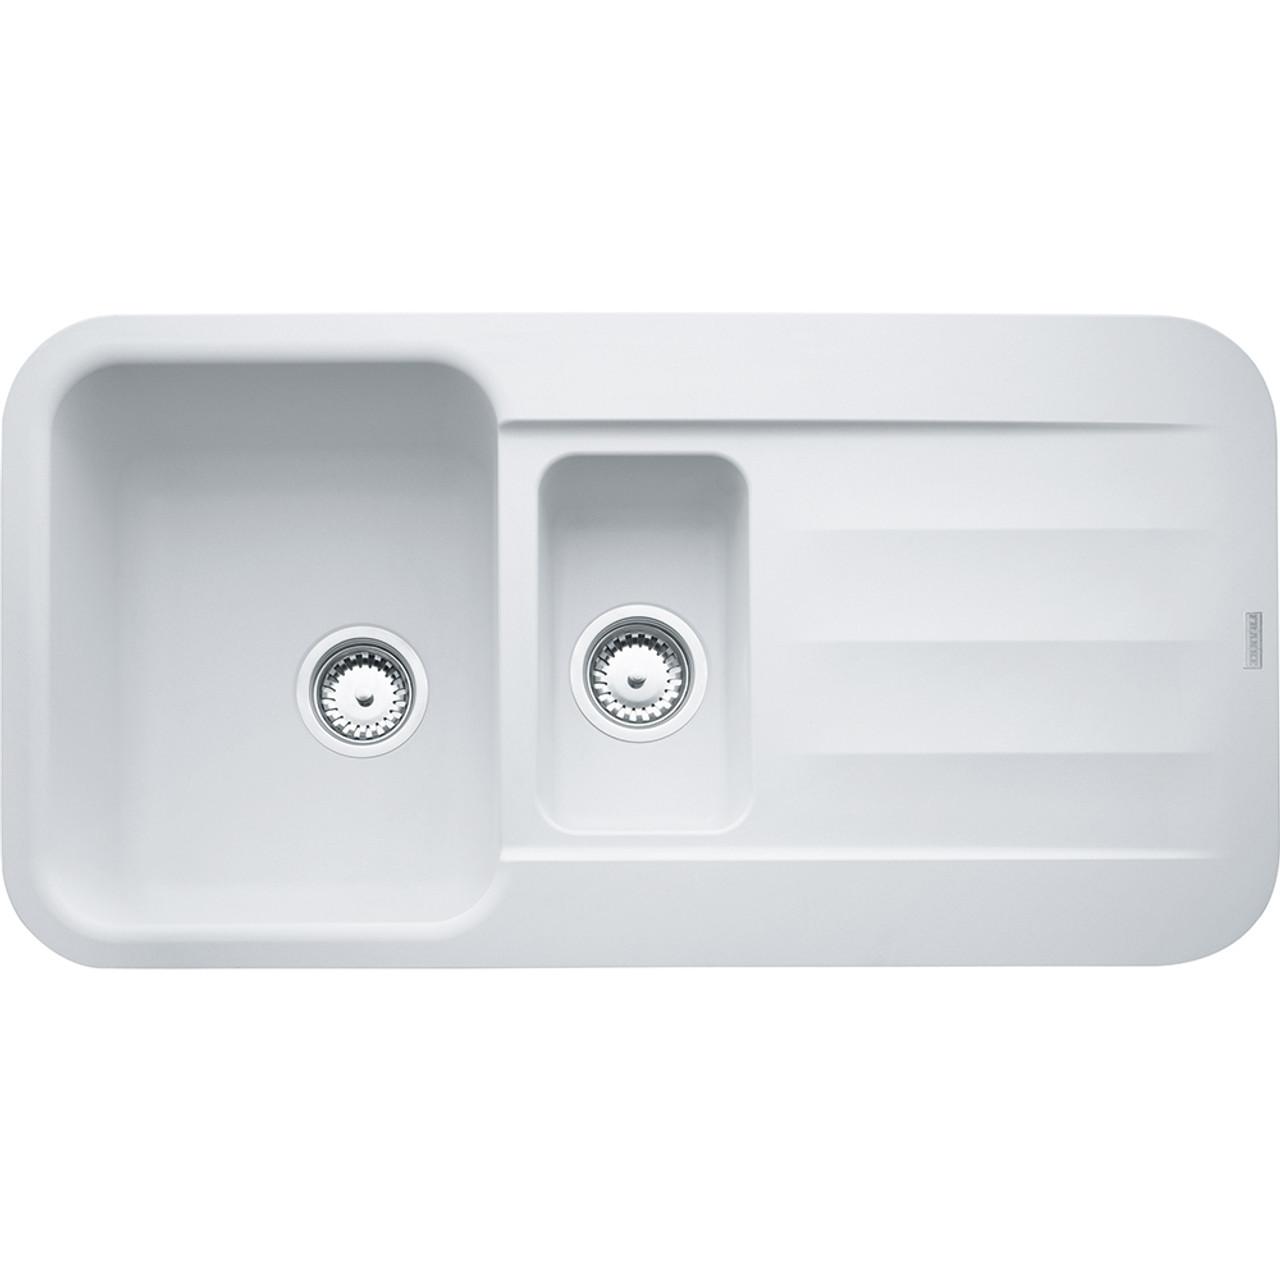 ... Franke Pebel PBG651 Fragranite Polar White Kitchen Sink ...